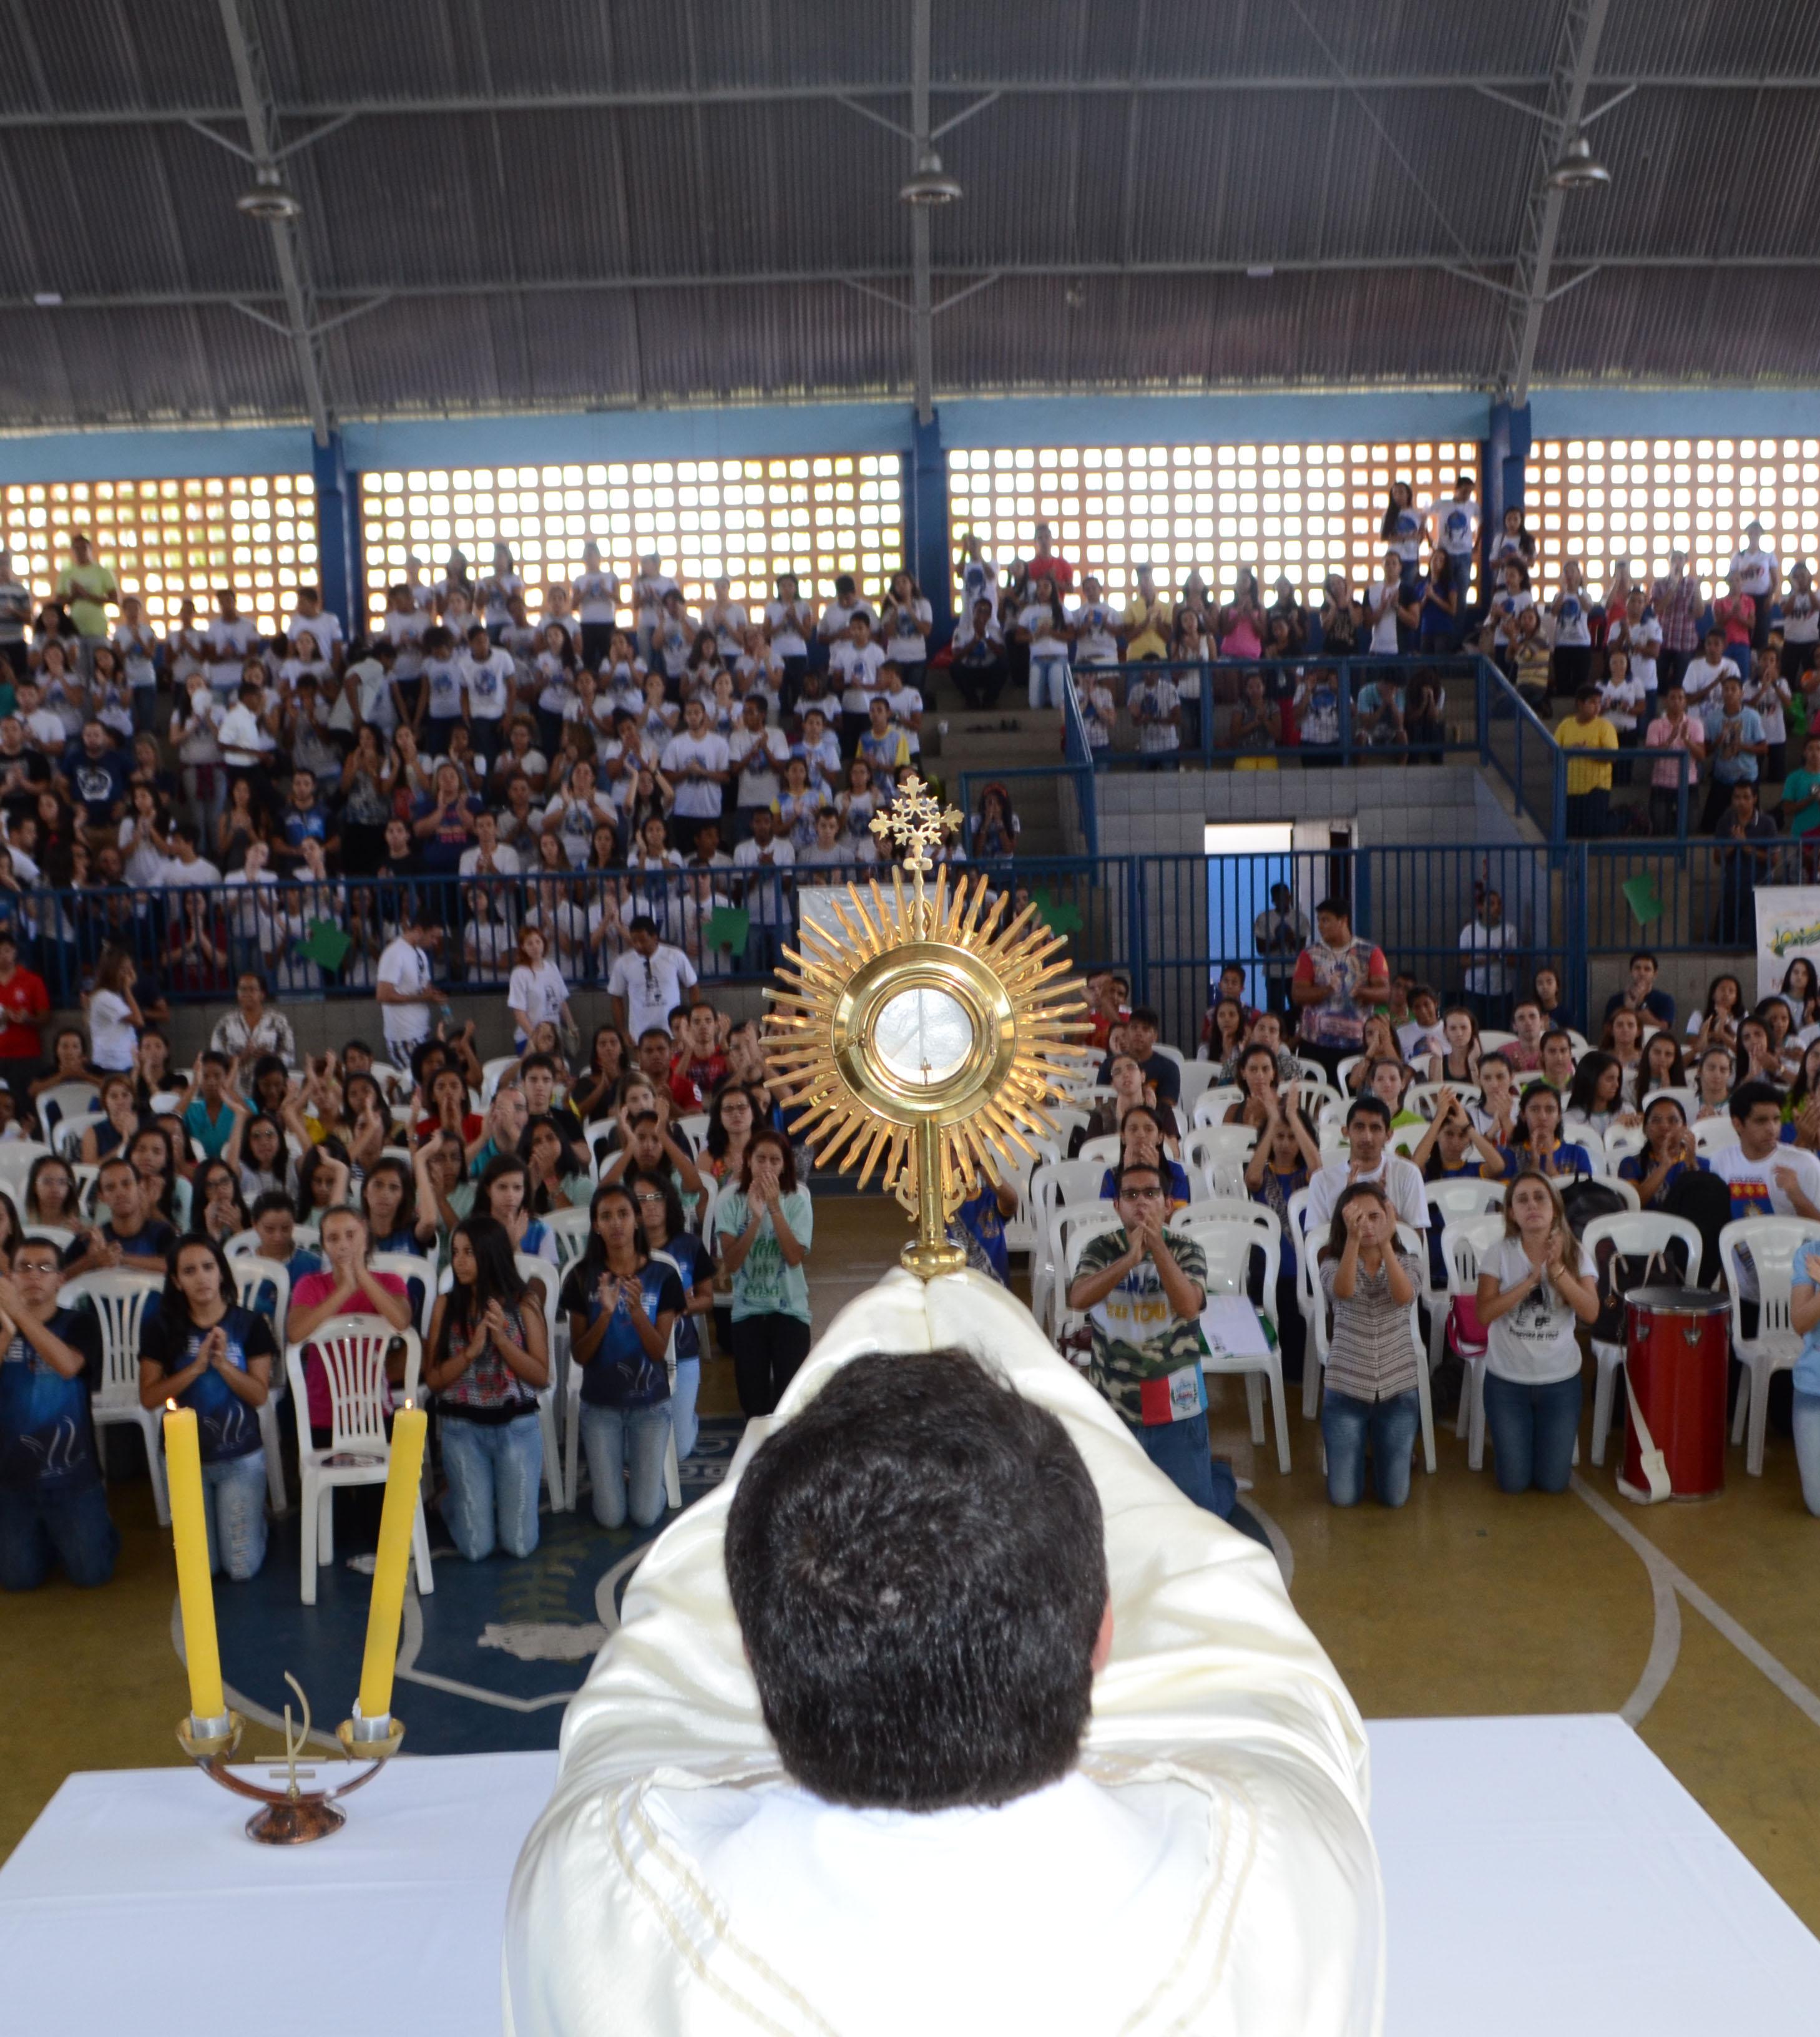 Jovens de Maceió celebraram DNJ no último domingo